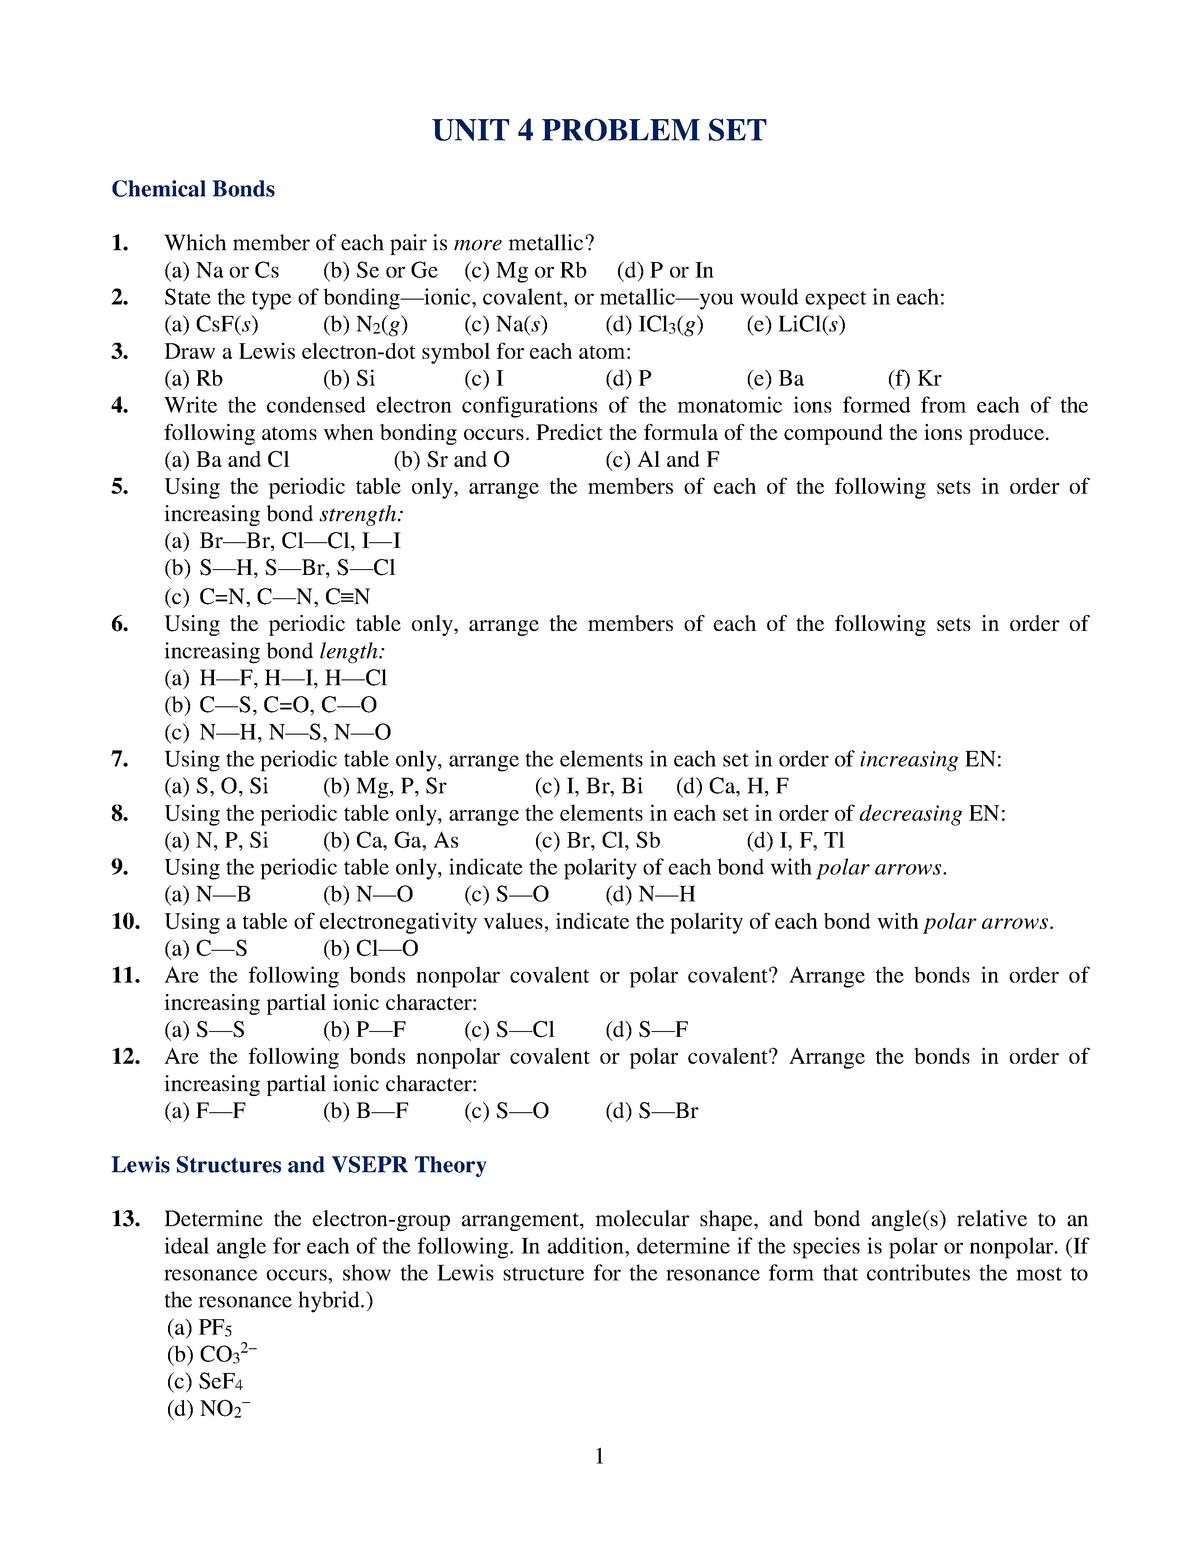 CHEM 1120 Unit 4 Problem Set - StuDocu